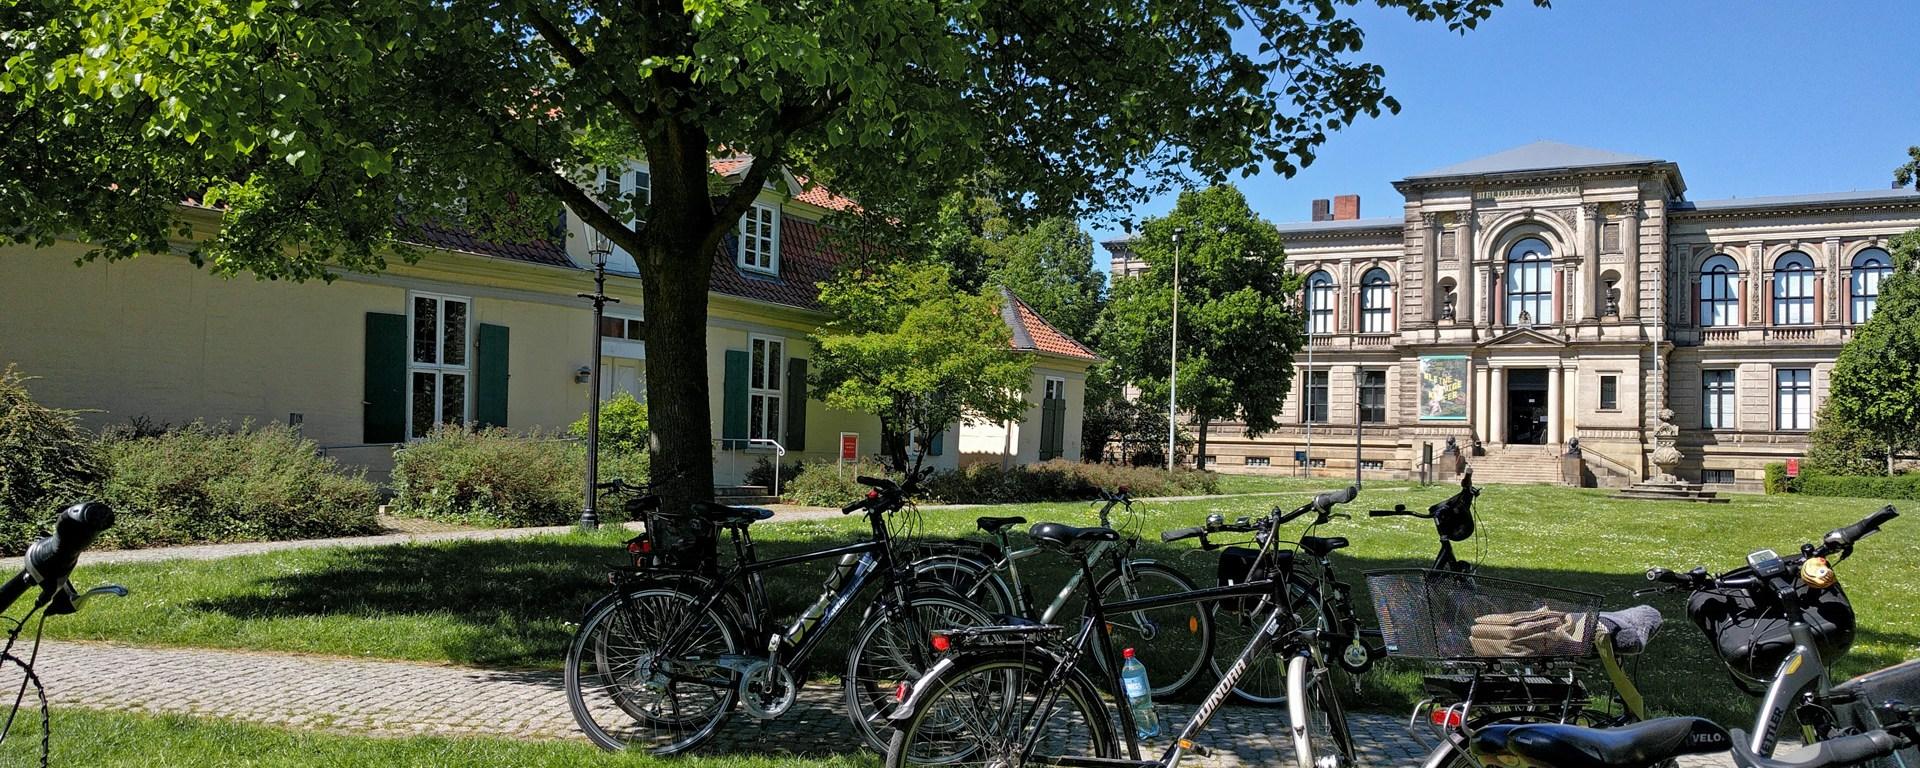 Links das Lessinghaus, rechts die Herzog August Bibliothek